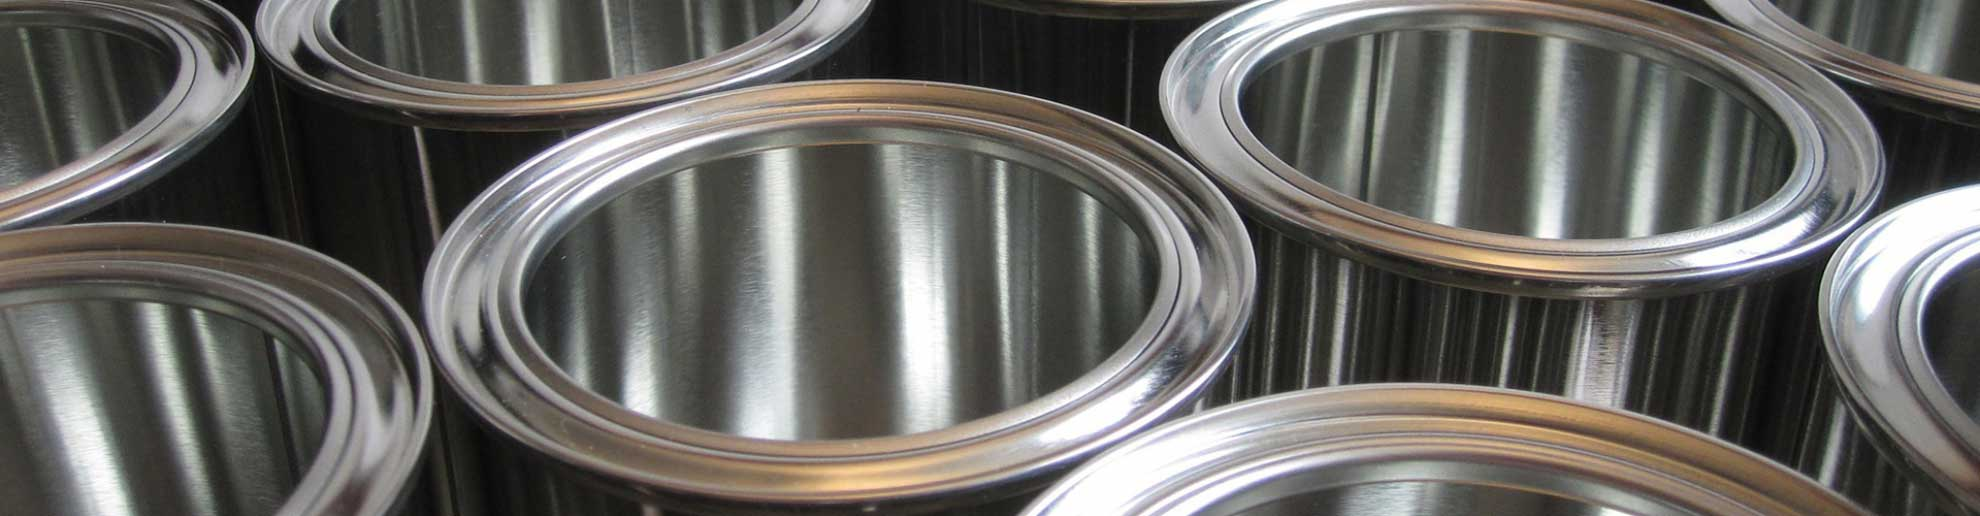 Защита металлических поверхностей от коррозии